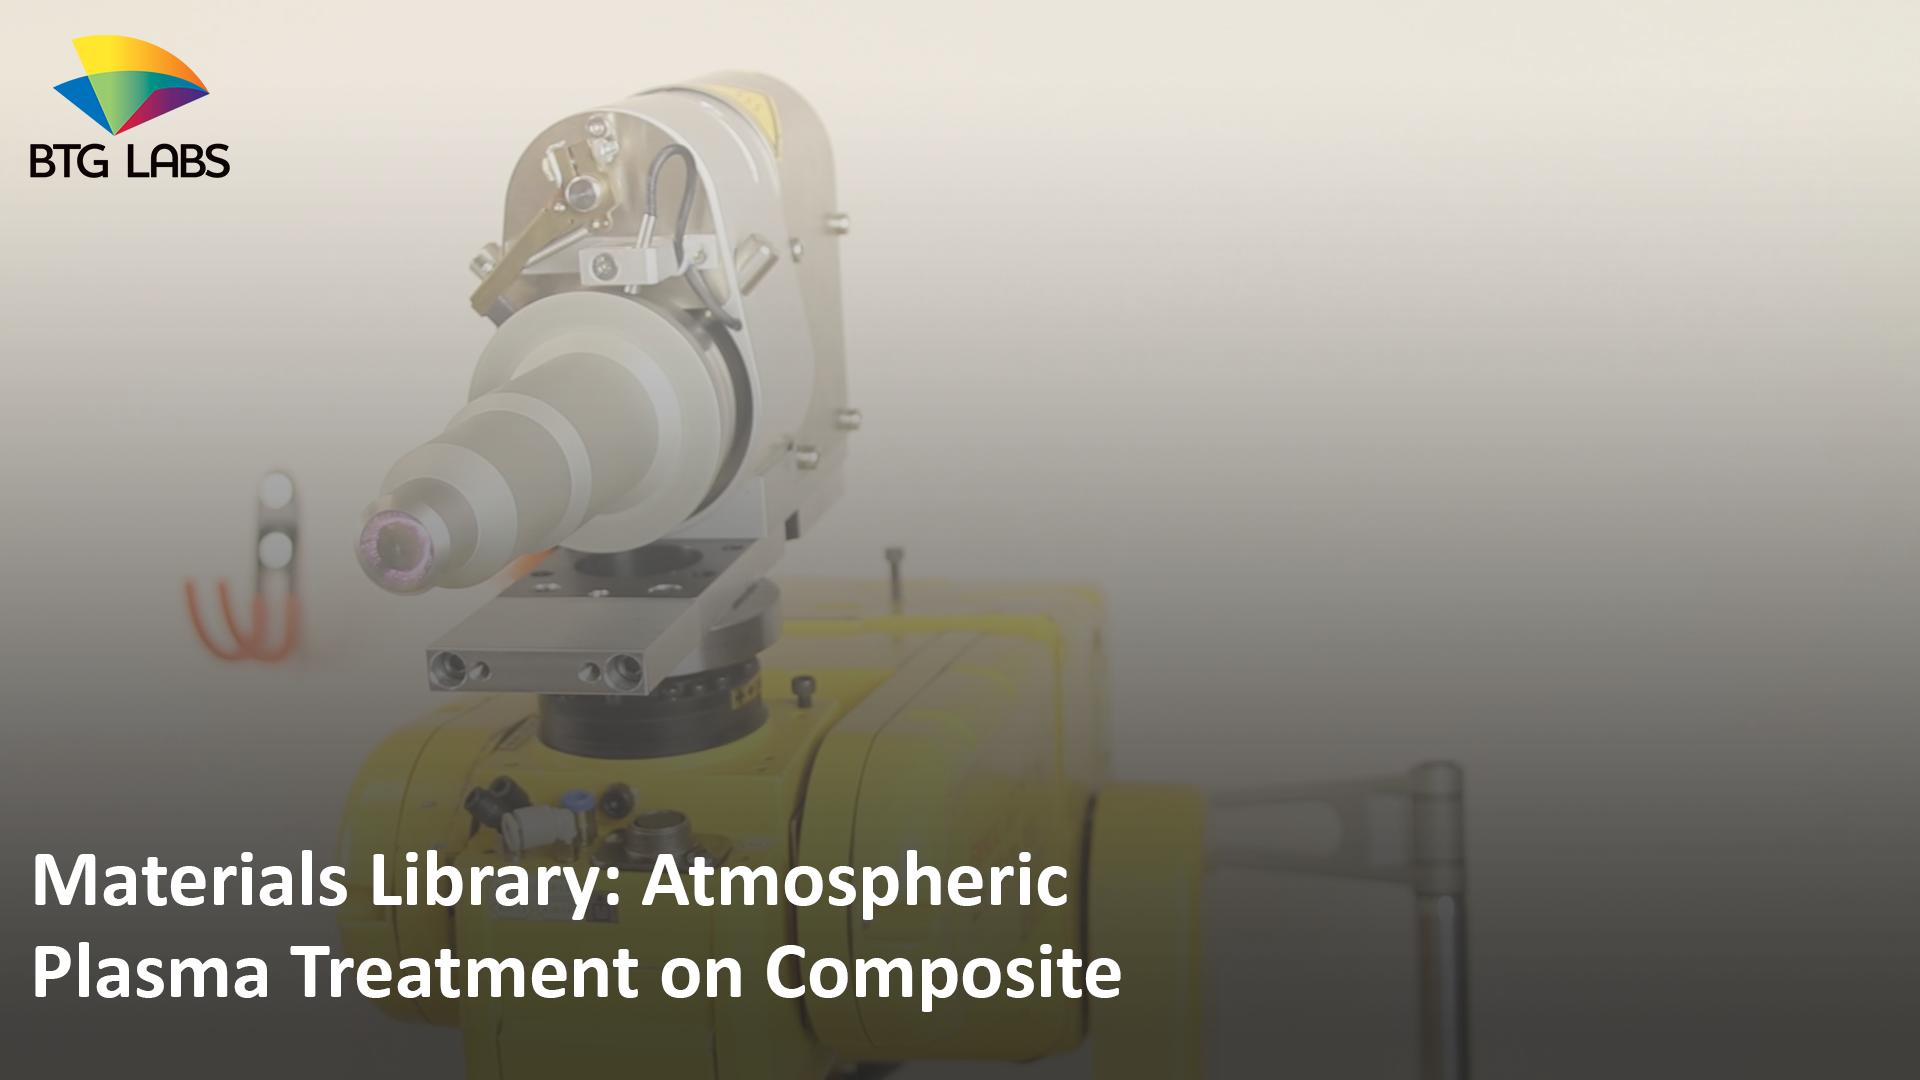 MaterialsLibrary_Composite_Plasma